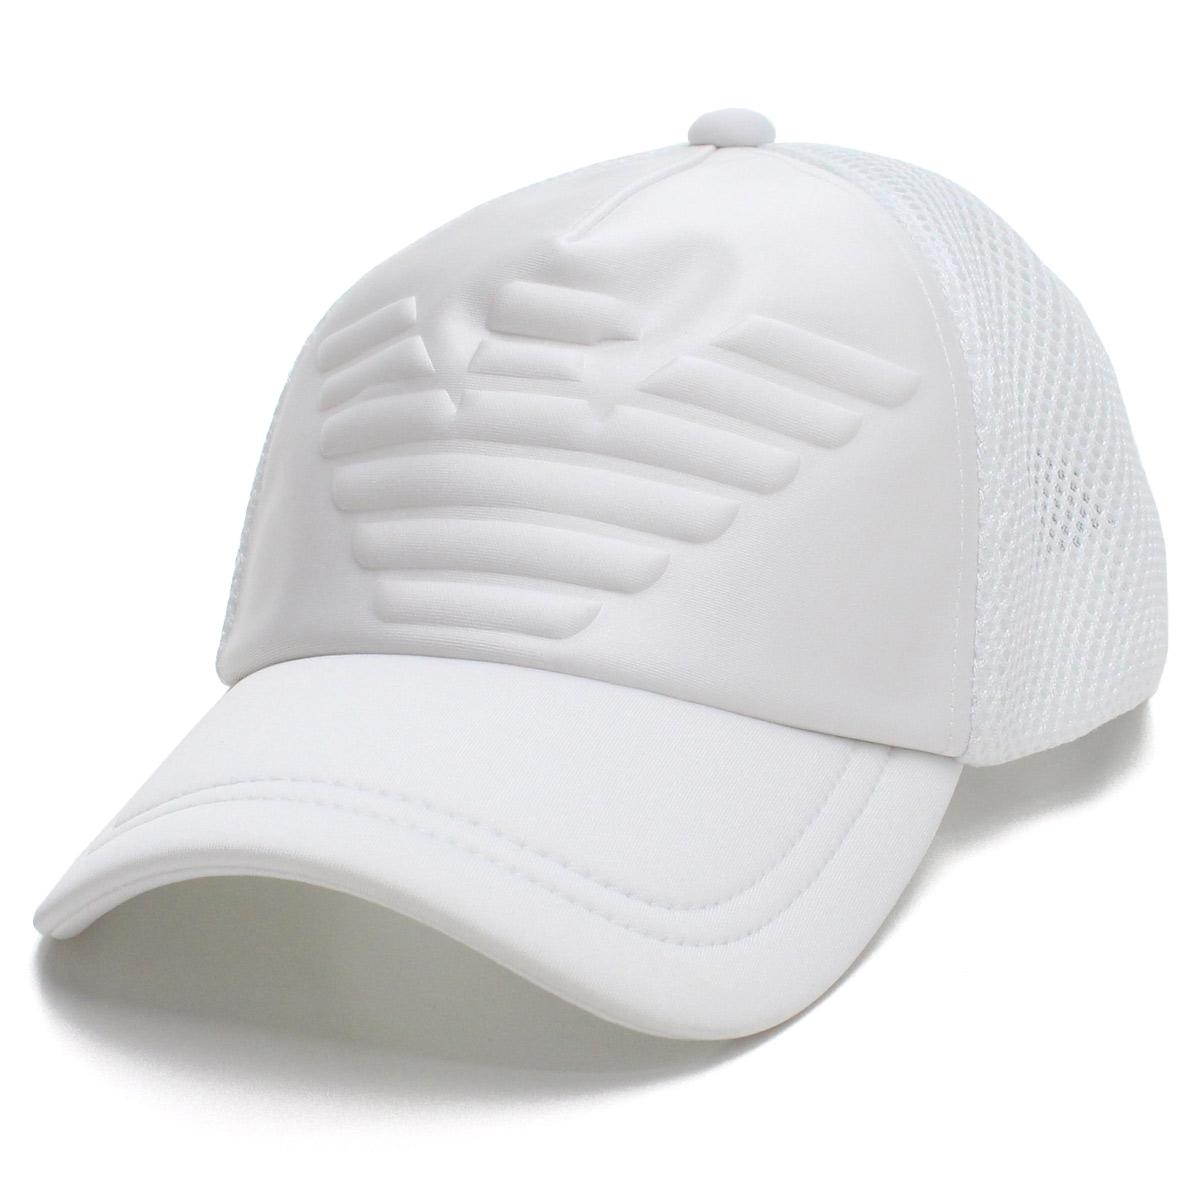 4eeb0e37cf0 Bighit The total brand wholesale  Emporio Armani EMPORIO ARMANI eagle logo  mesh cap baseball cap 627524 9P556 00010 BIANCO white system